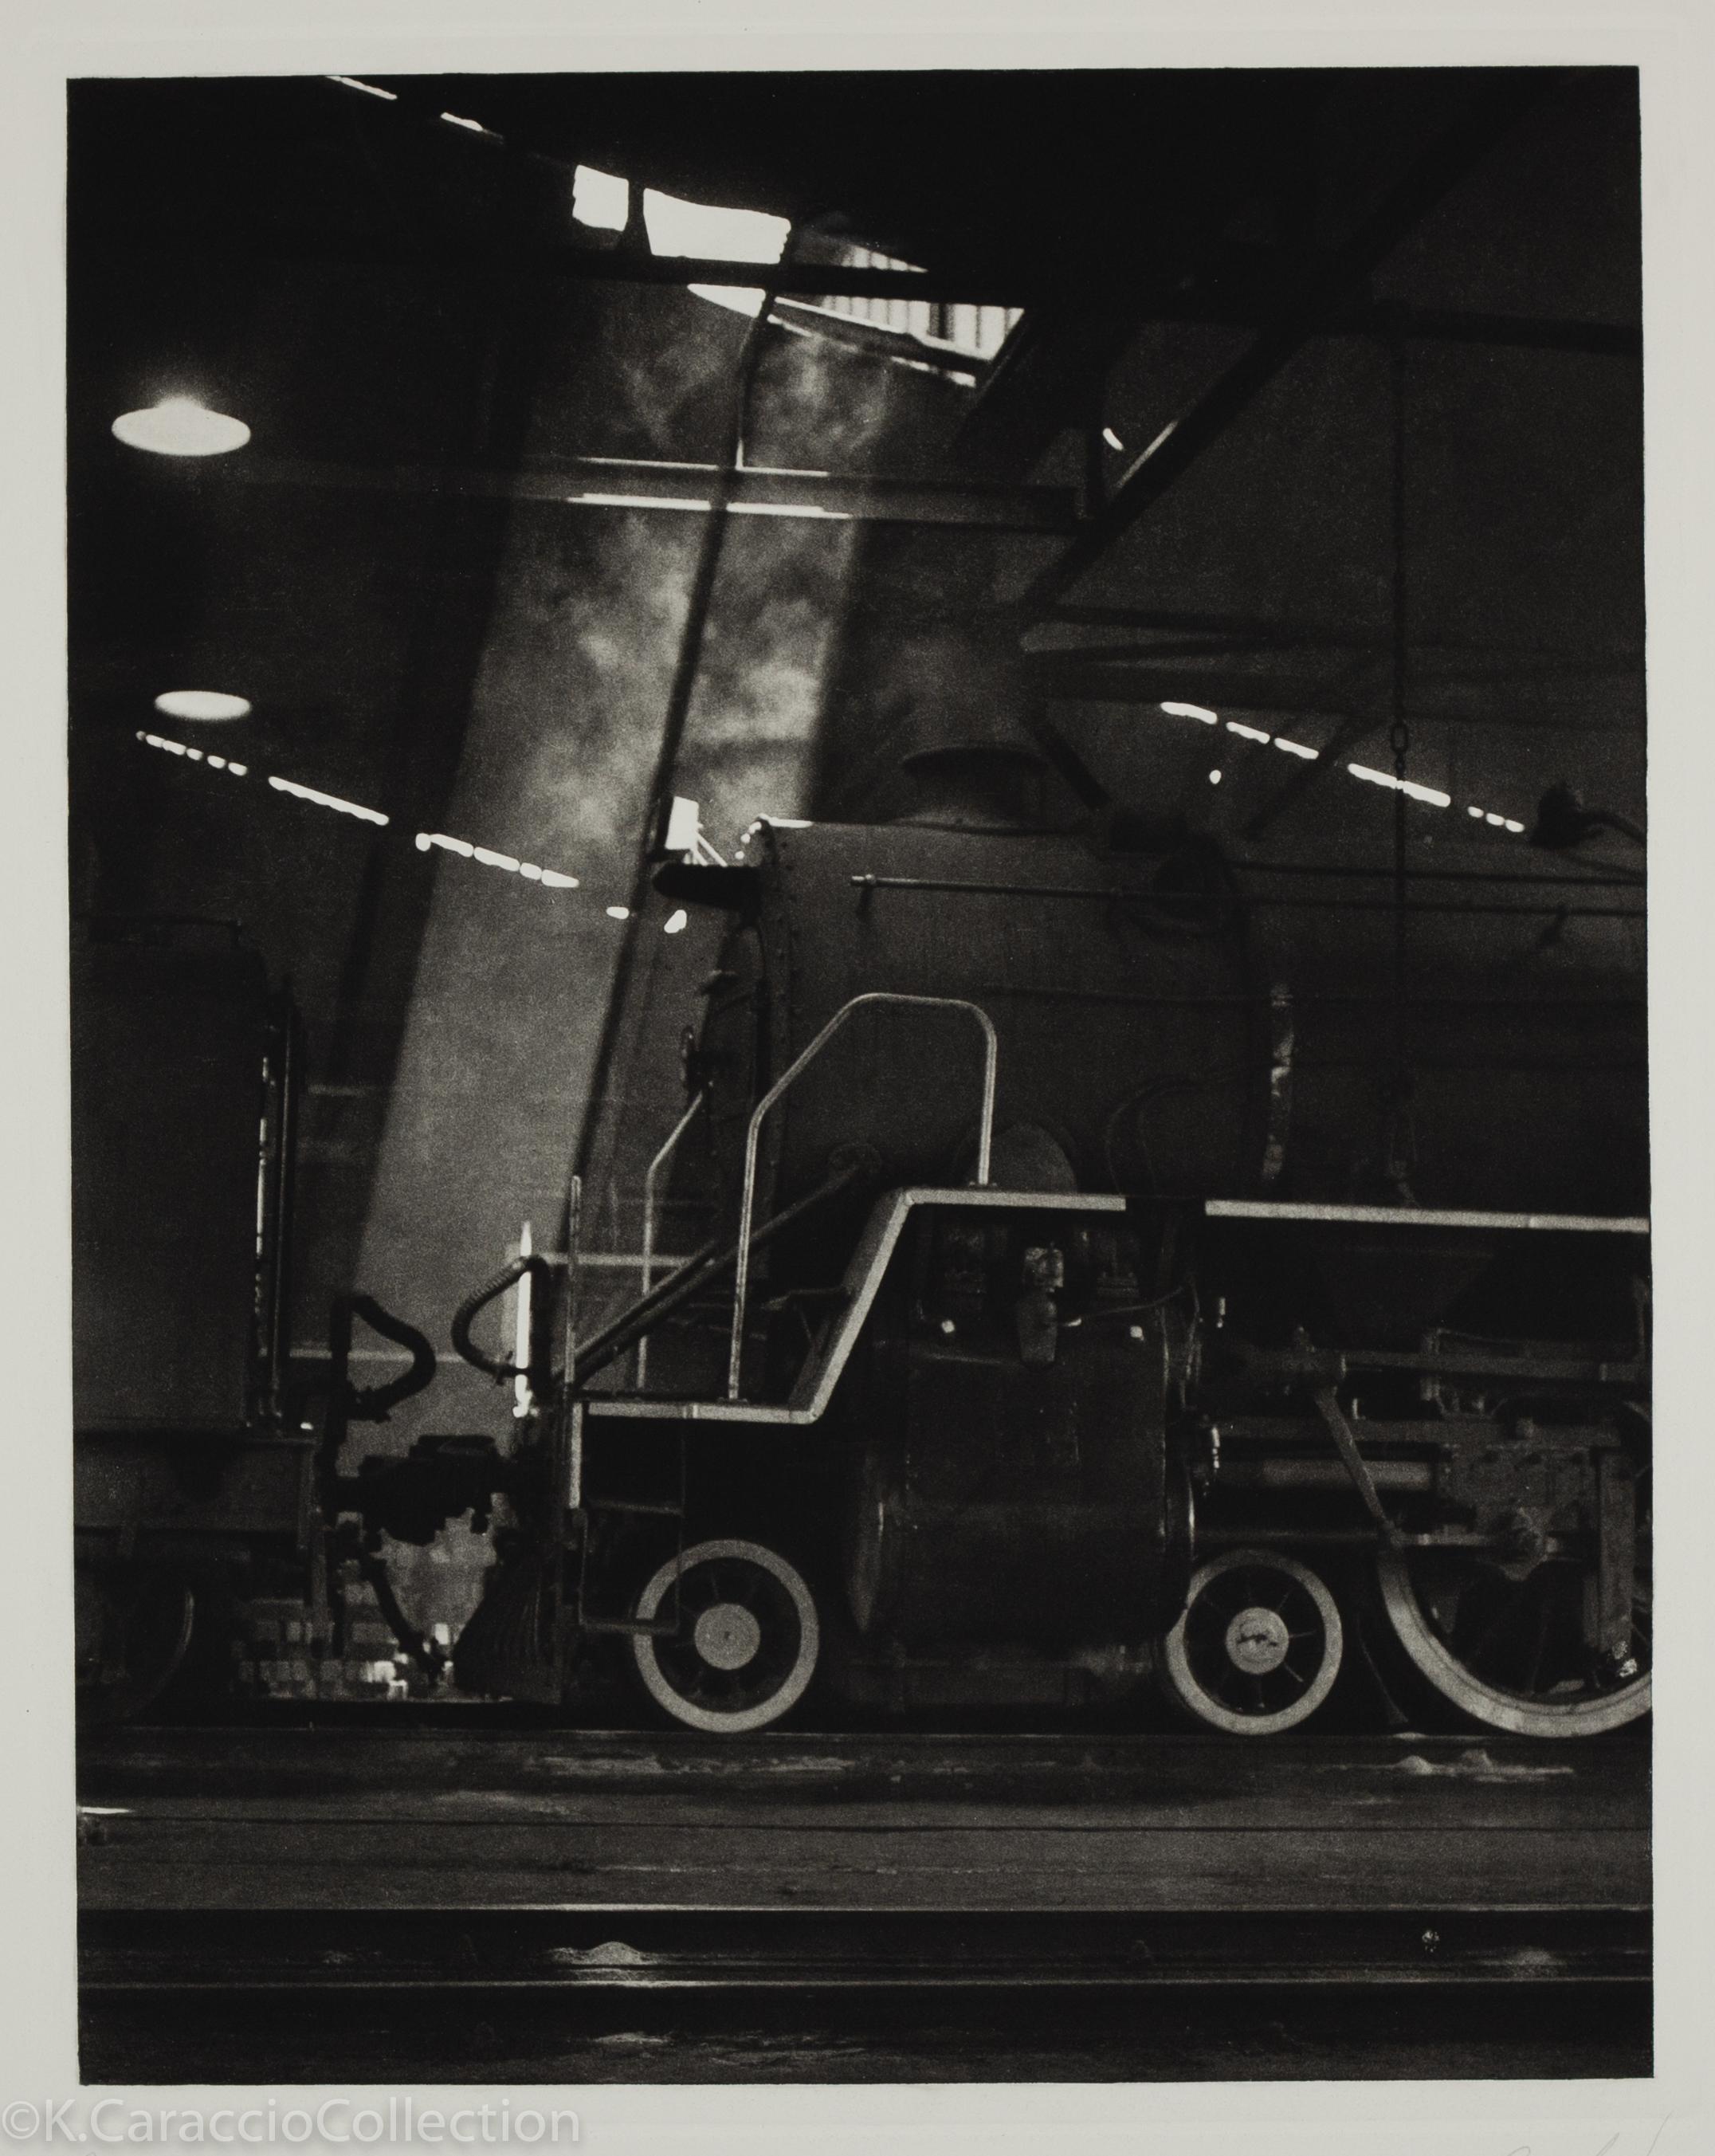 Capetown Black and White Locomotive, 1984